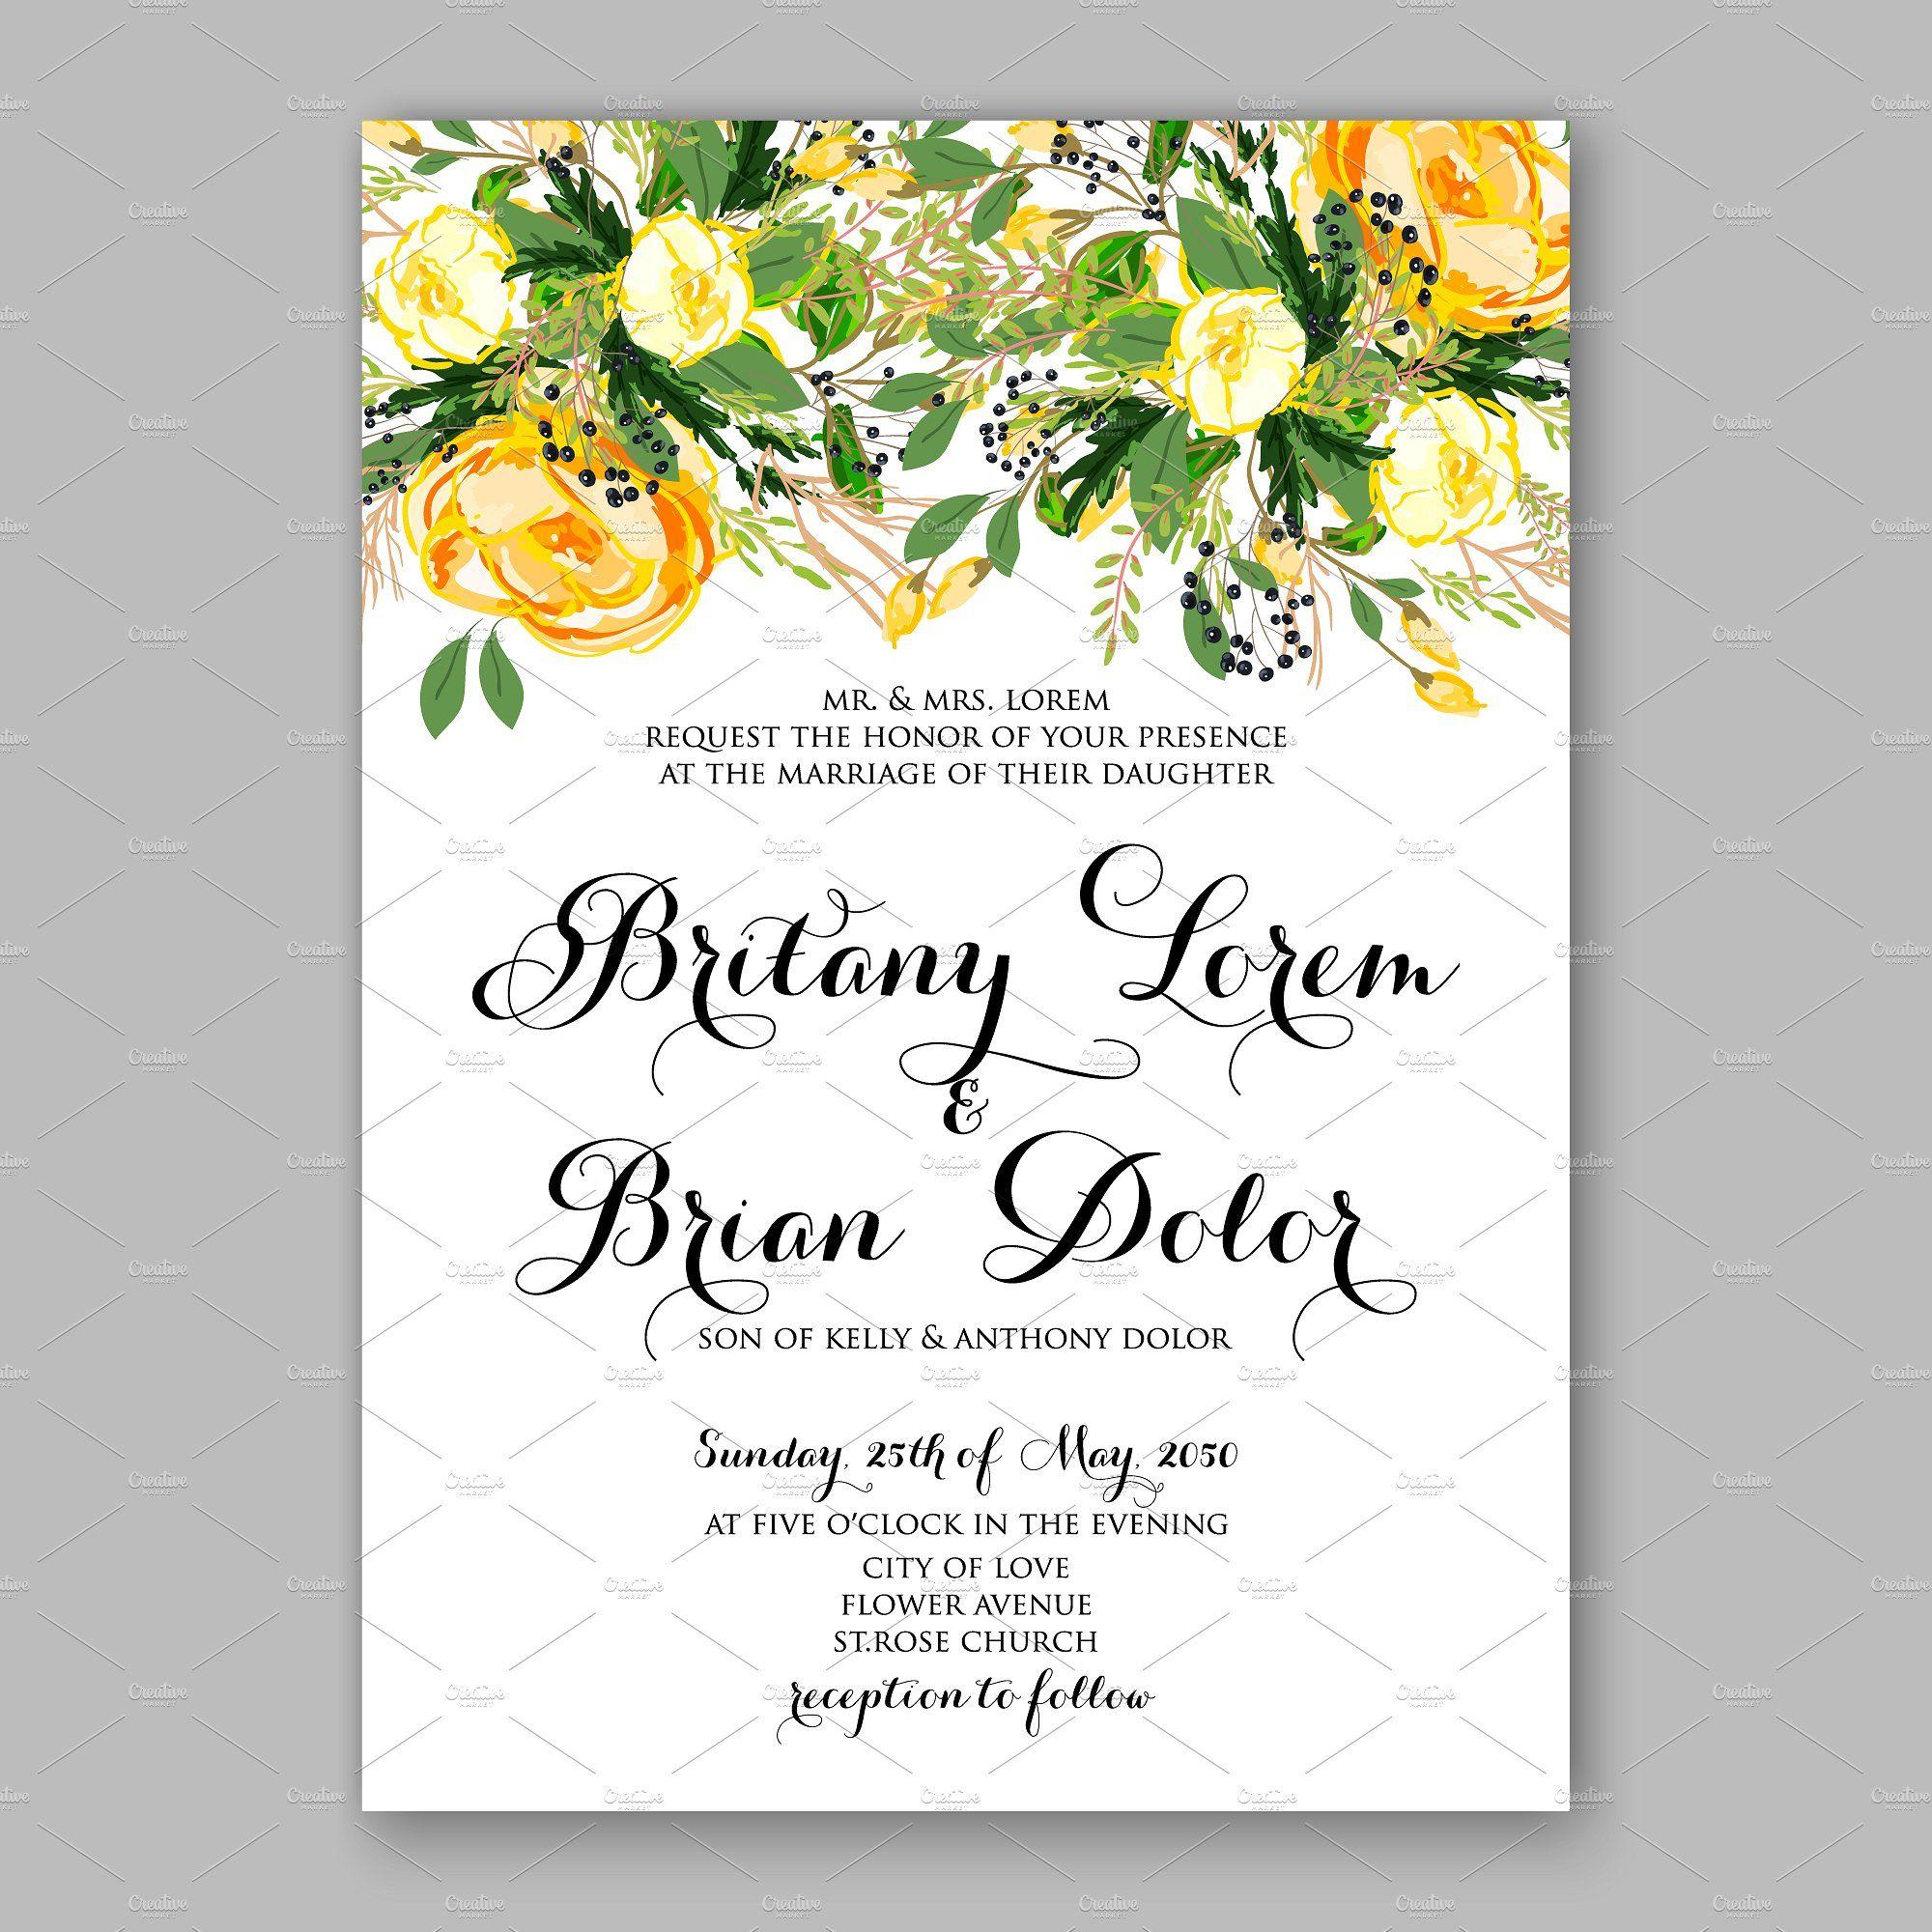 Wedding invitation Yellow rose  Yellow wedding invitations